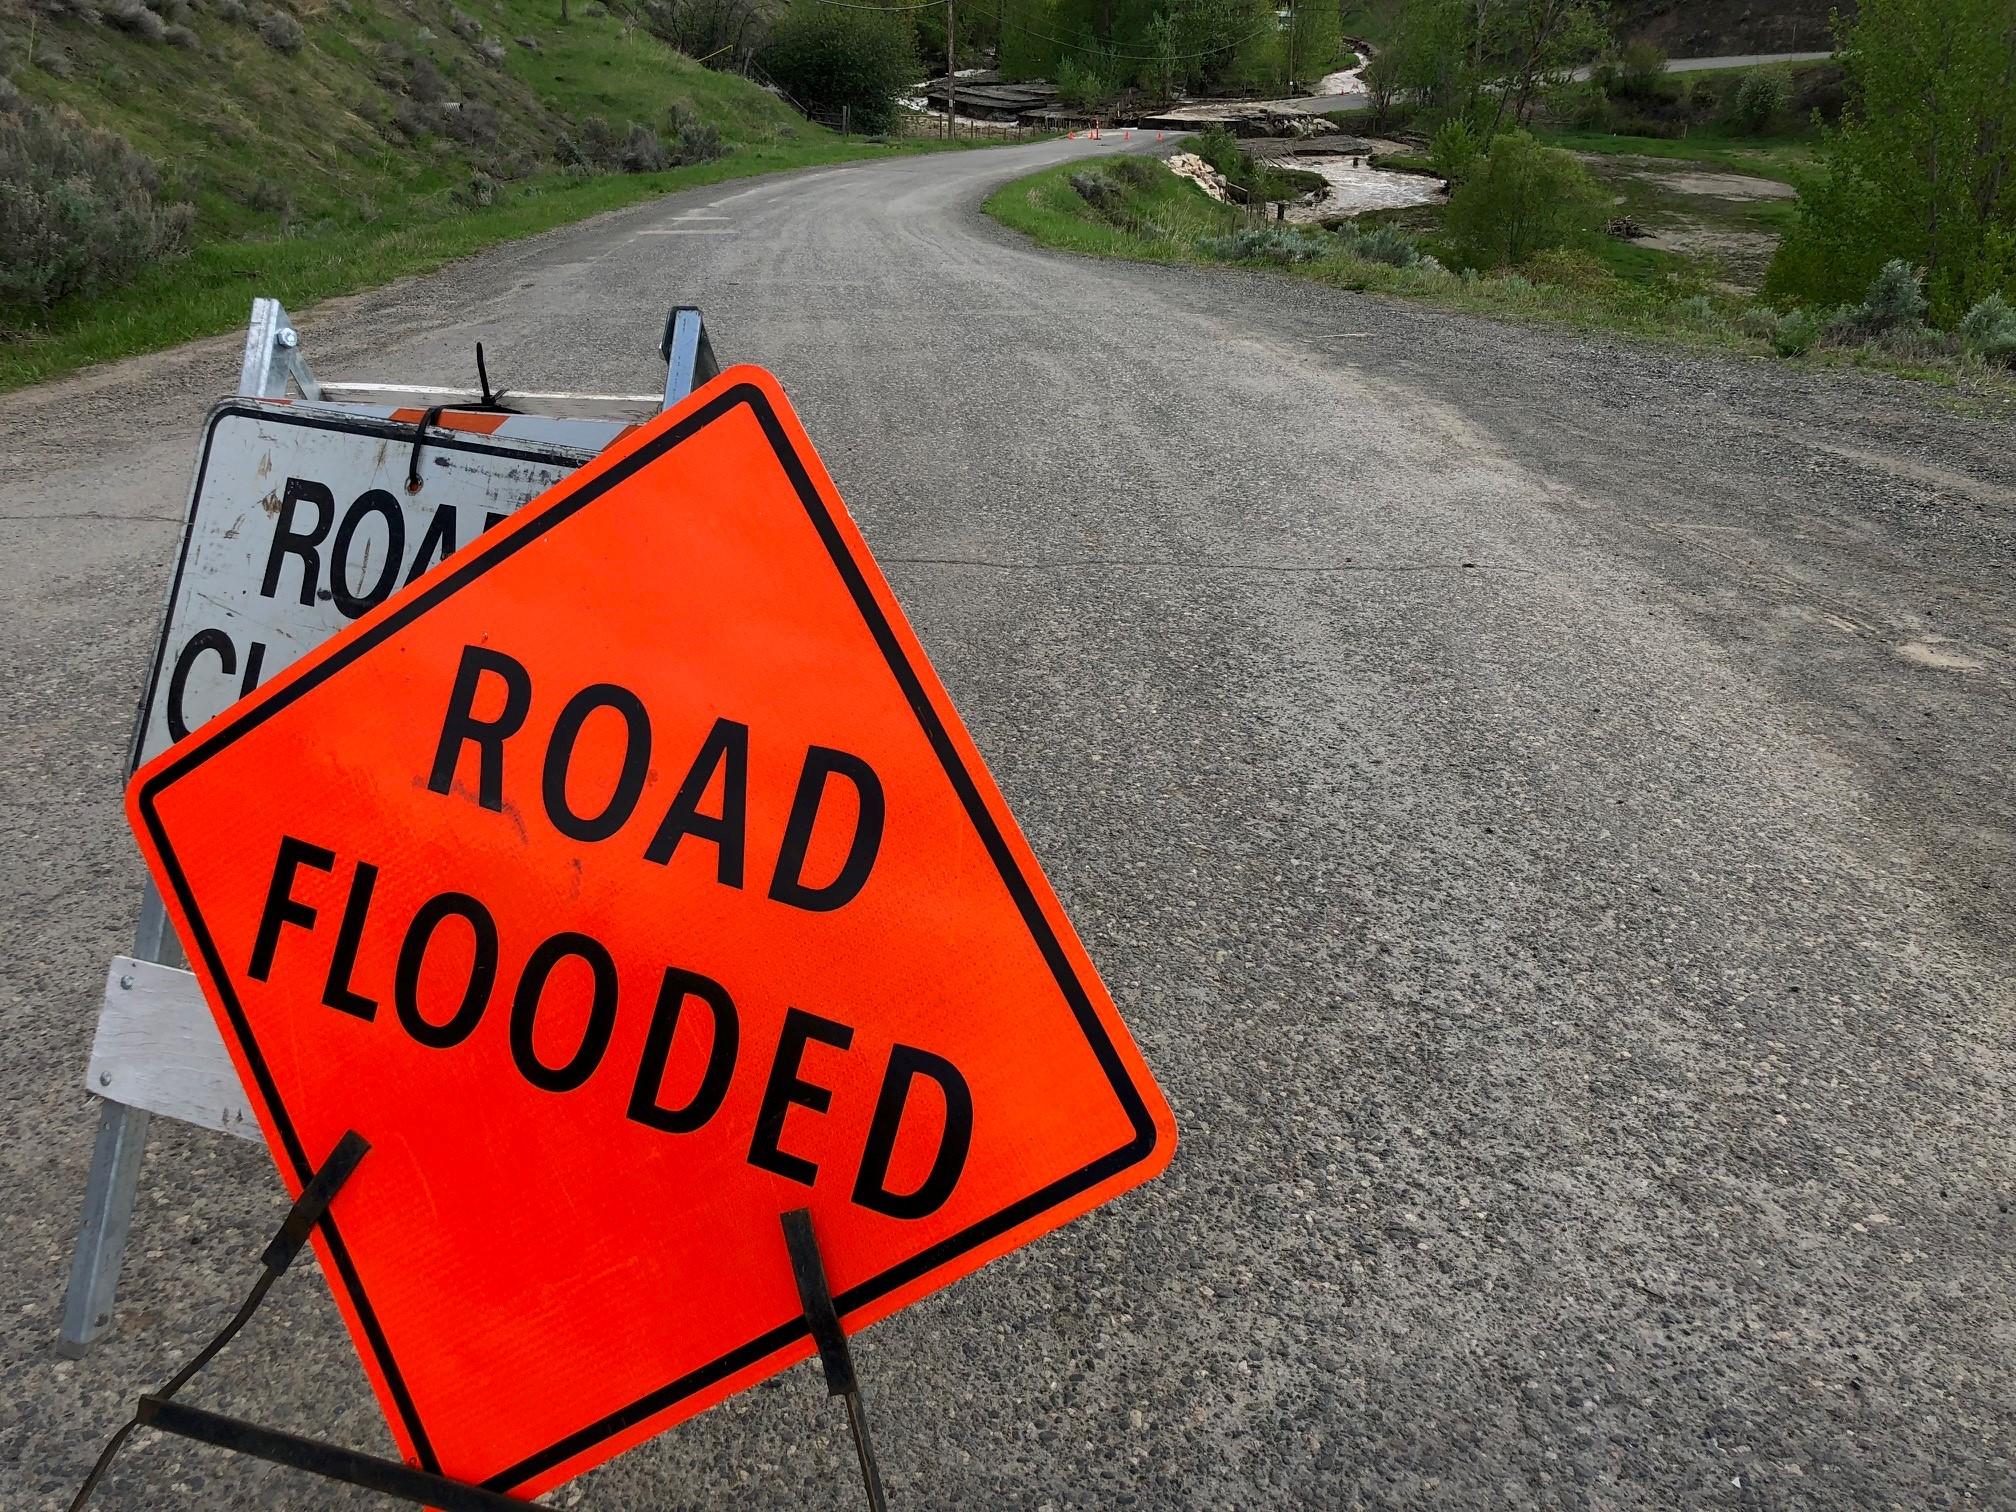 TNRD flood damage bill has now exceeded one million dollars